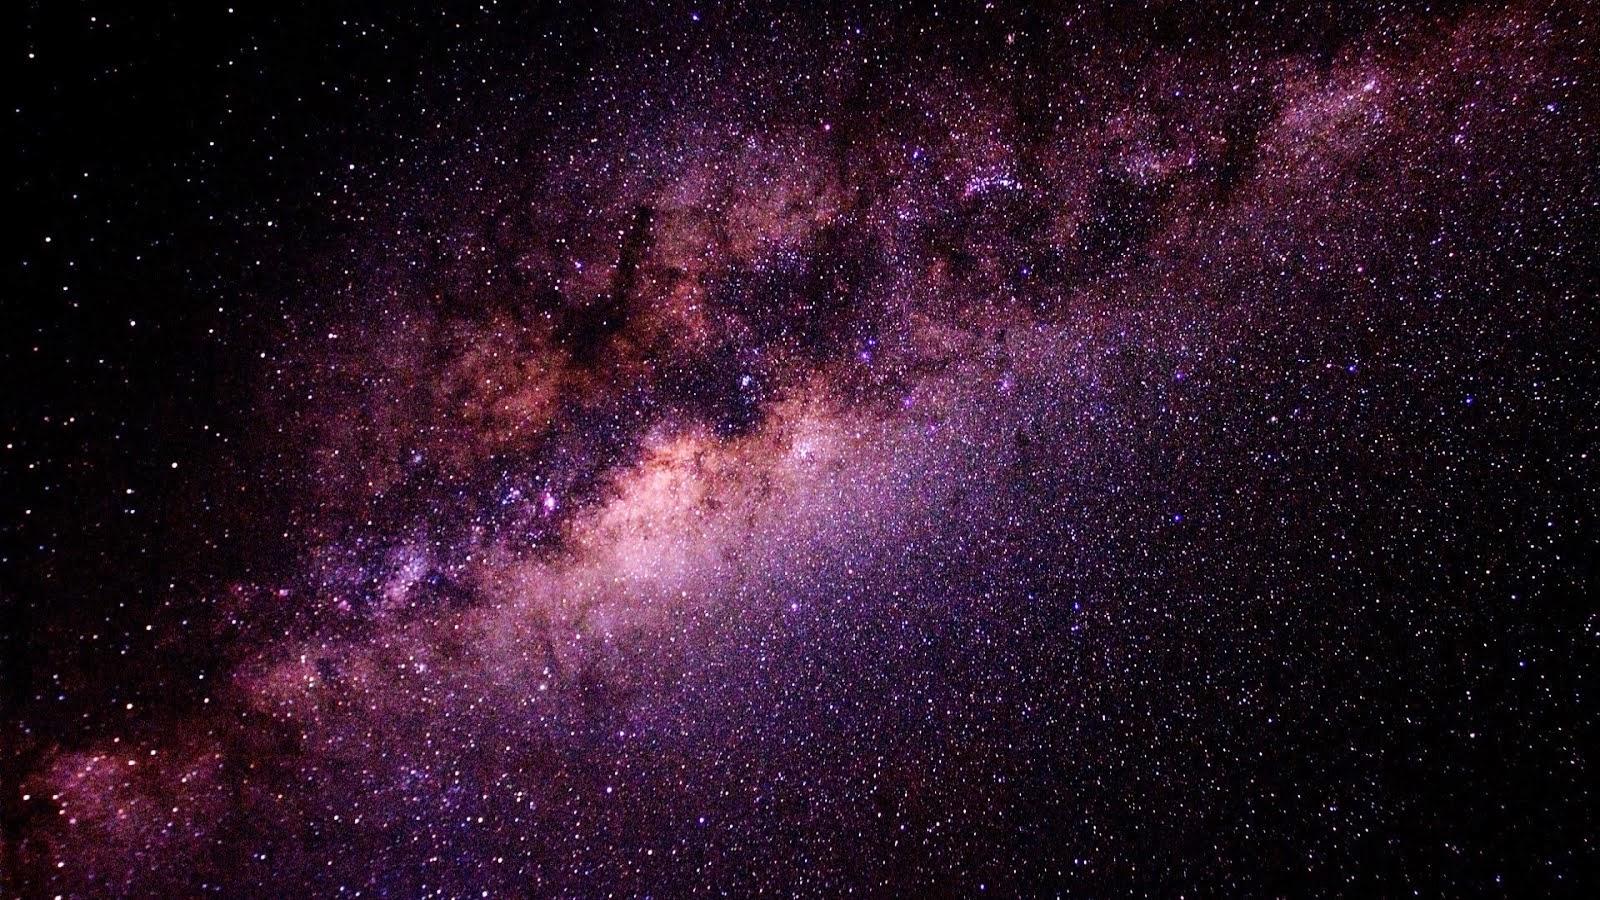 Galaxy Hd Wallpapers 1080p Wallpapersafari